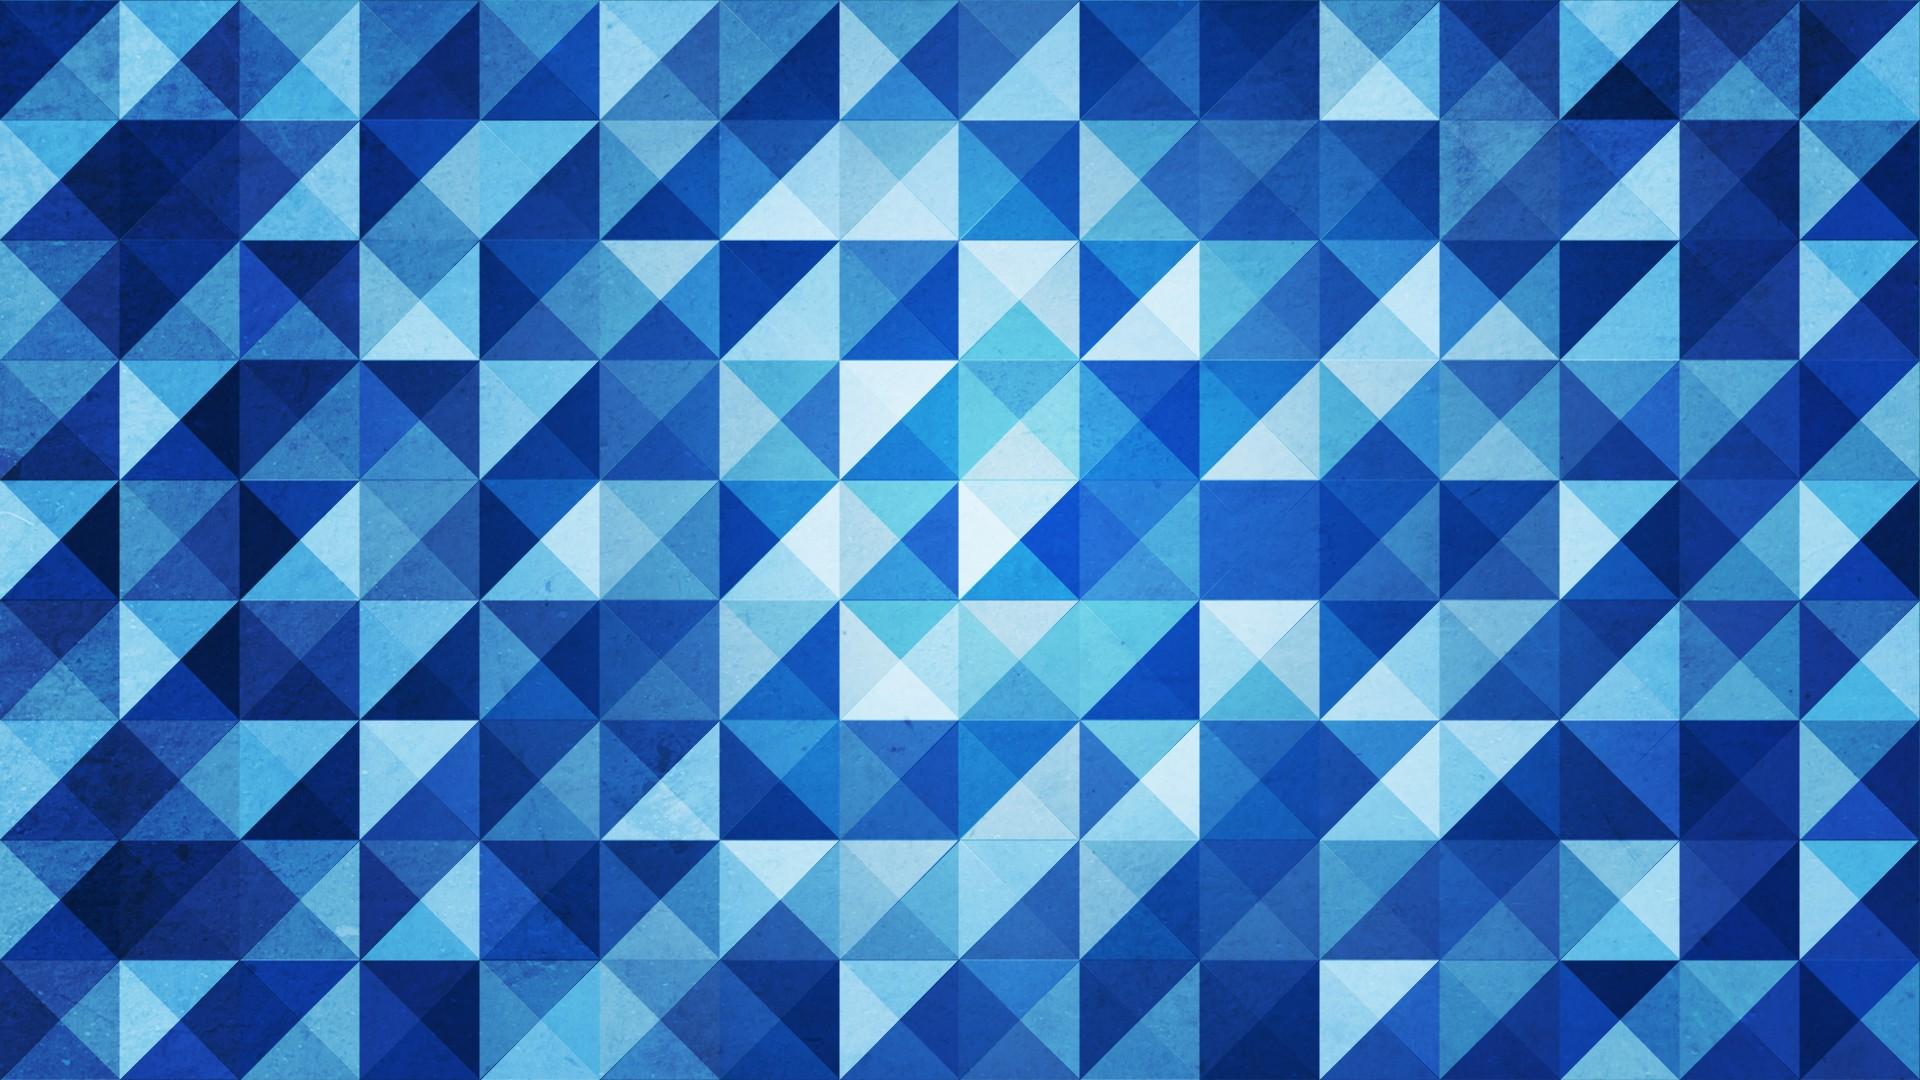 Illusion Wallpapers Free Download | PixelsTalk Net